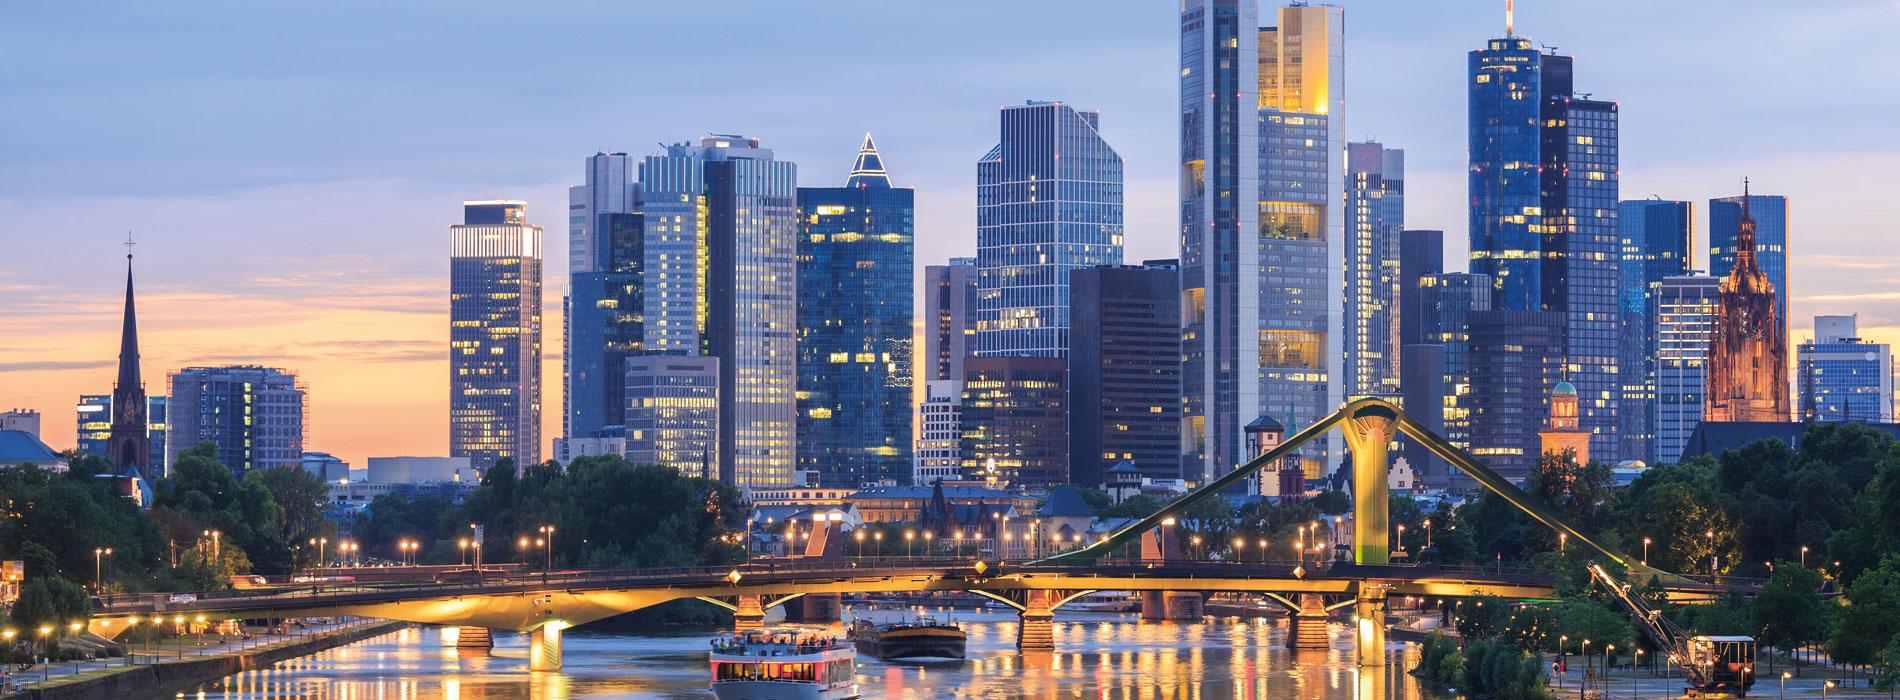 ``Metropole Frankfurt Skyline``